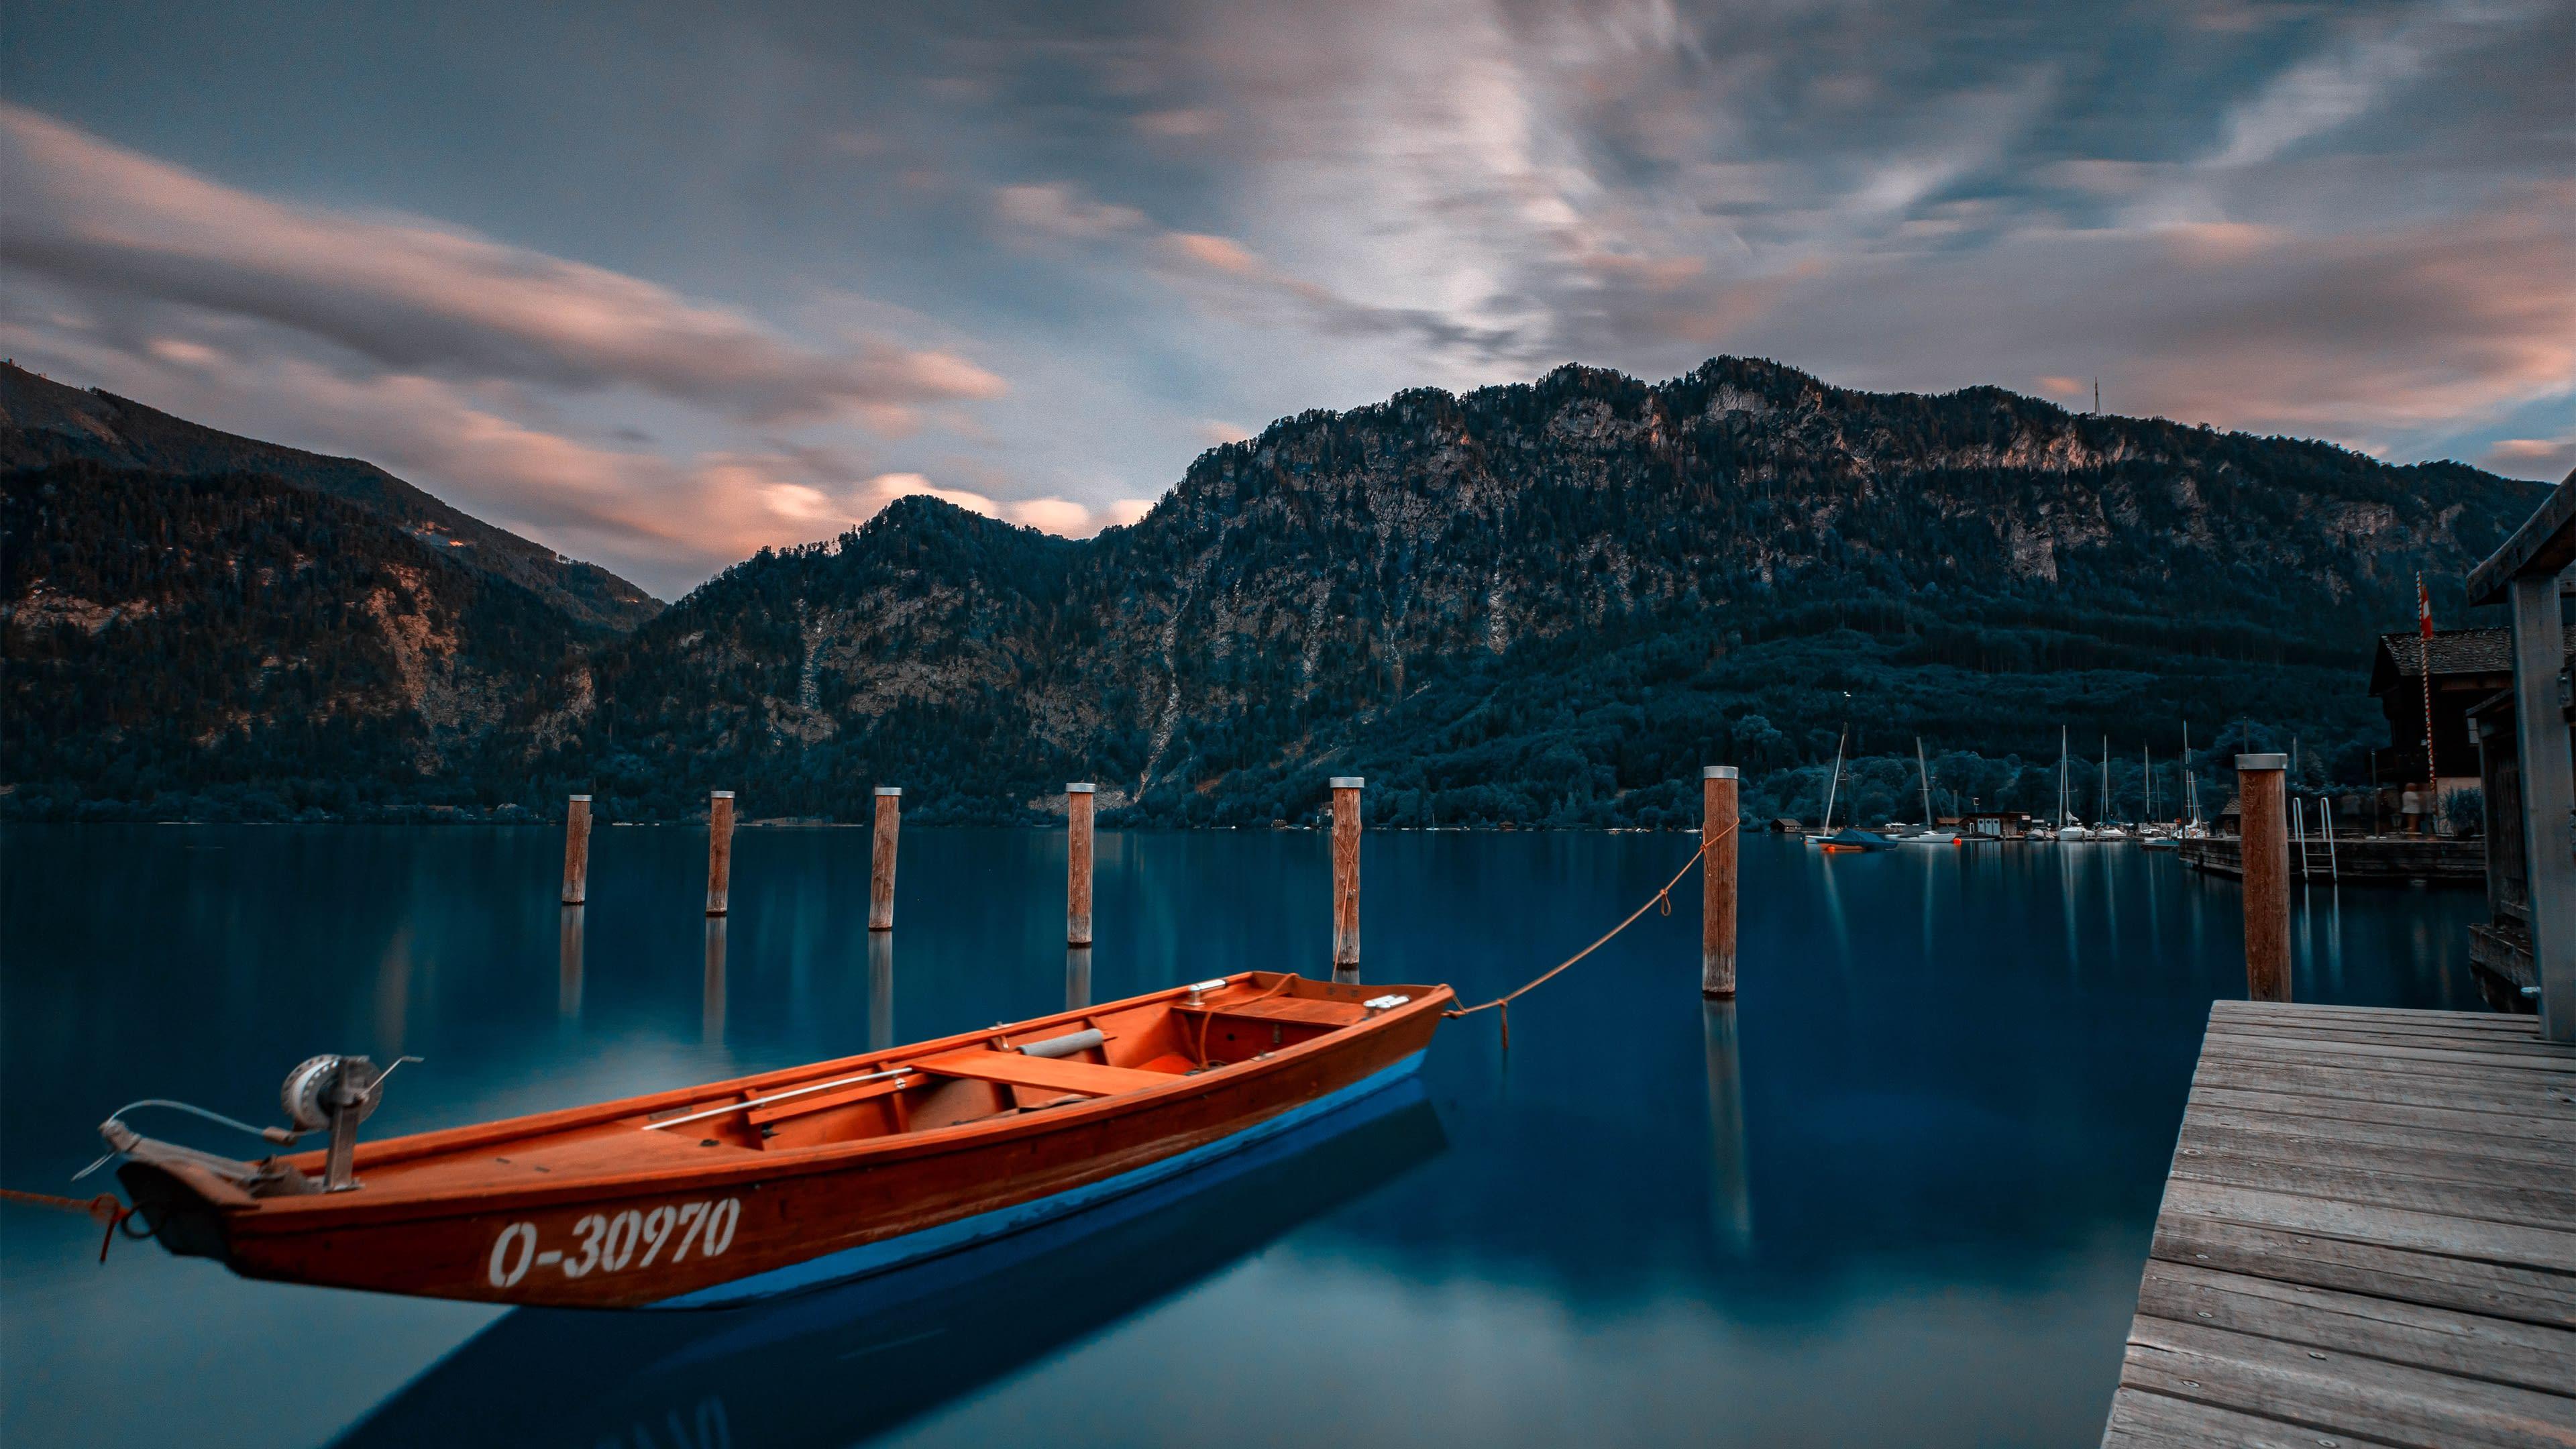 Frozen sunset on the lake by Manuel Arslanyan - دانلود Ubuntu 19.10 یا Eoan Ermine